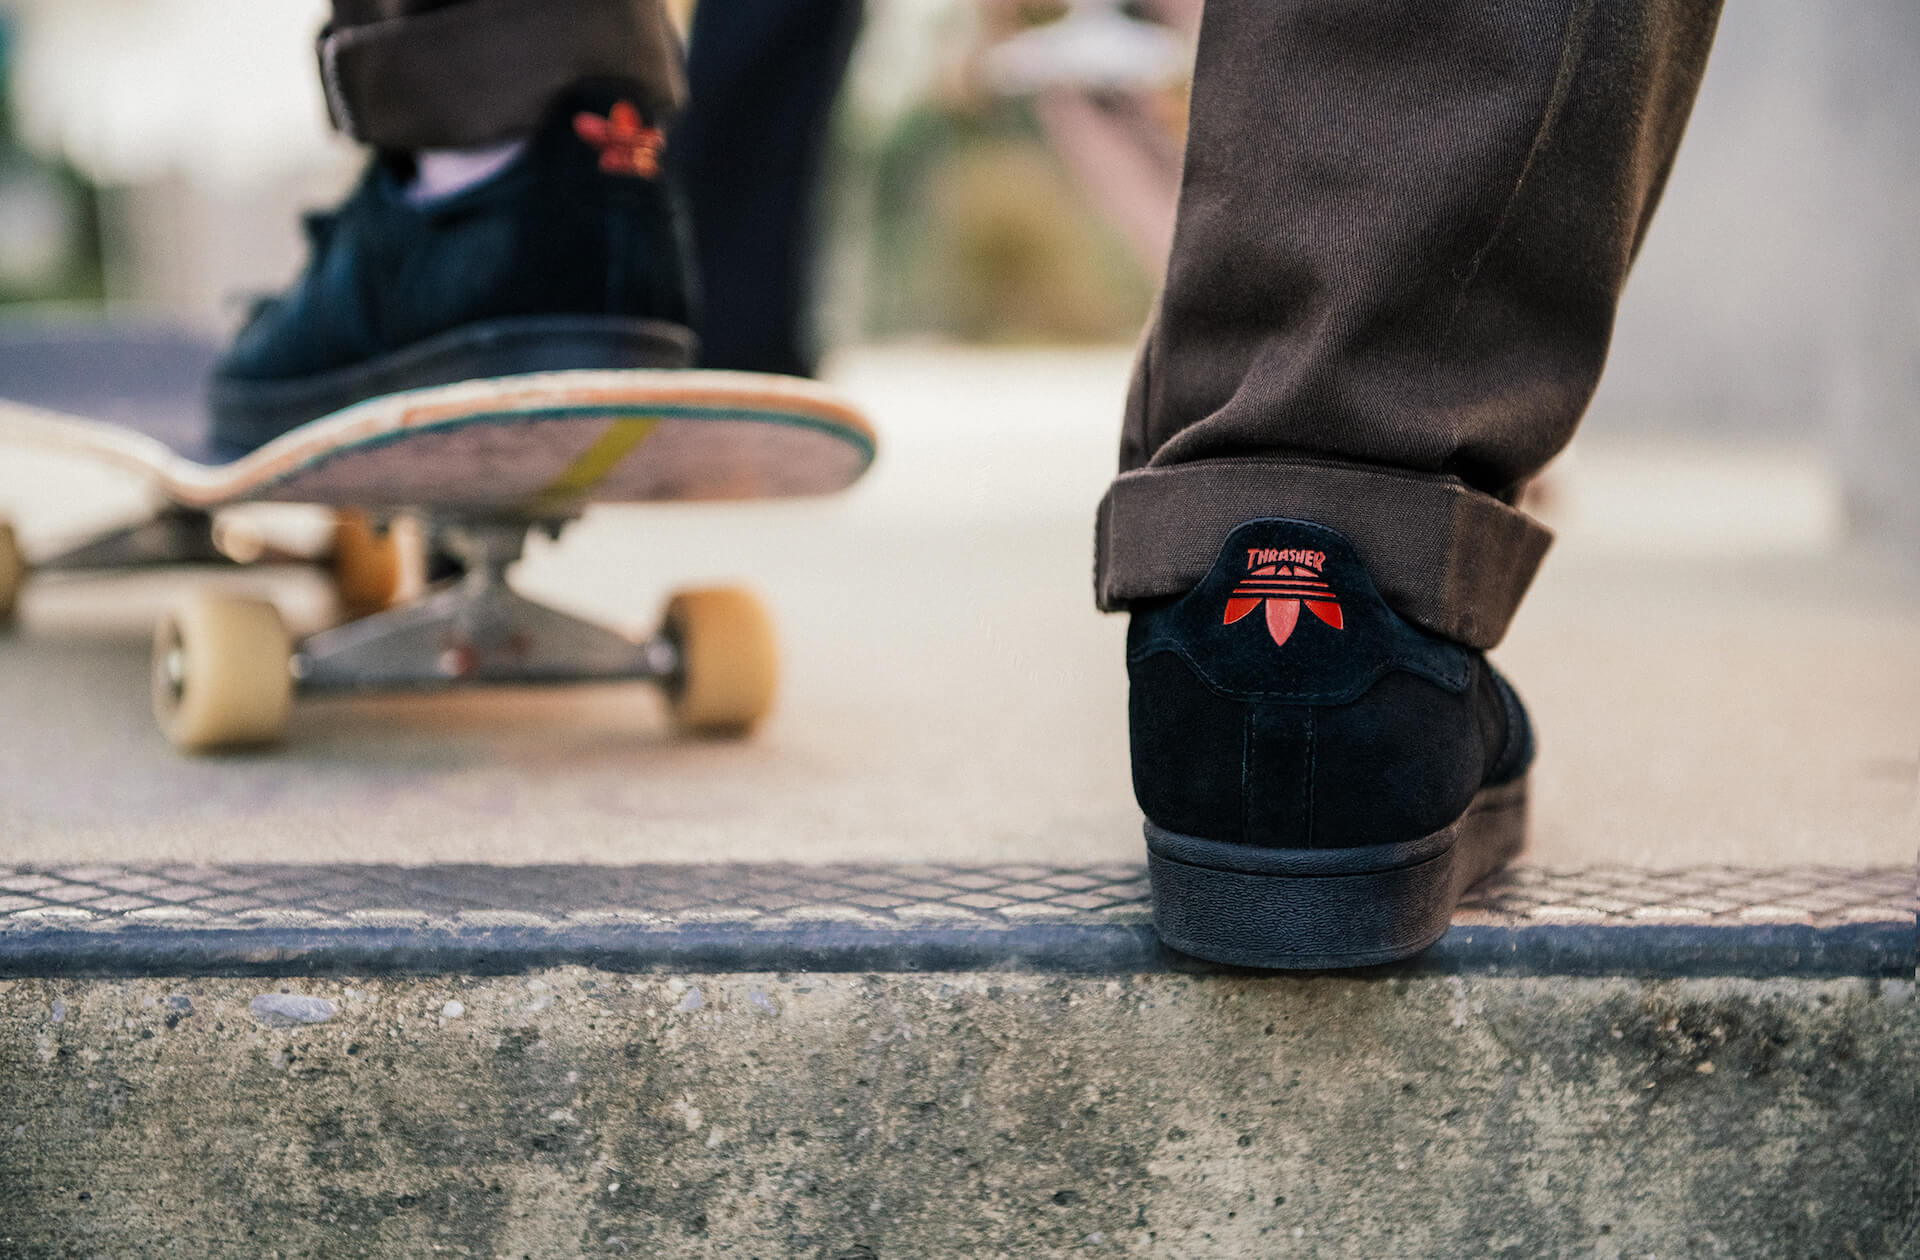 adidas SkateboardingとTHRASHERがコラボ!プロスケーターTyshawn Jonesのシグネチャーモデル&新型SUPERSTARが登場 life201126_adidas_skateboarding_13